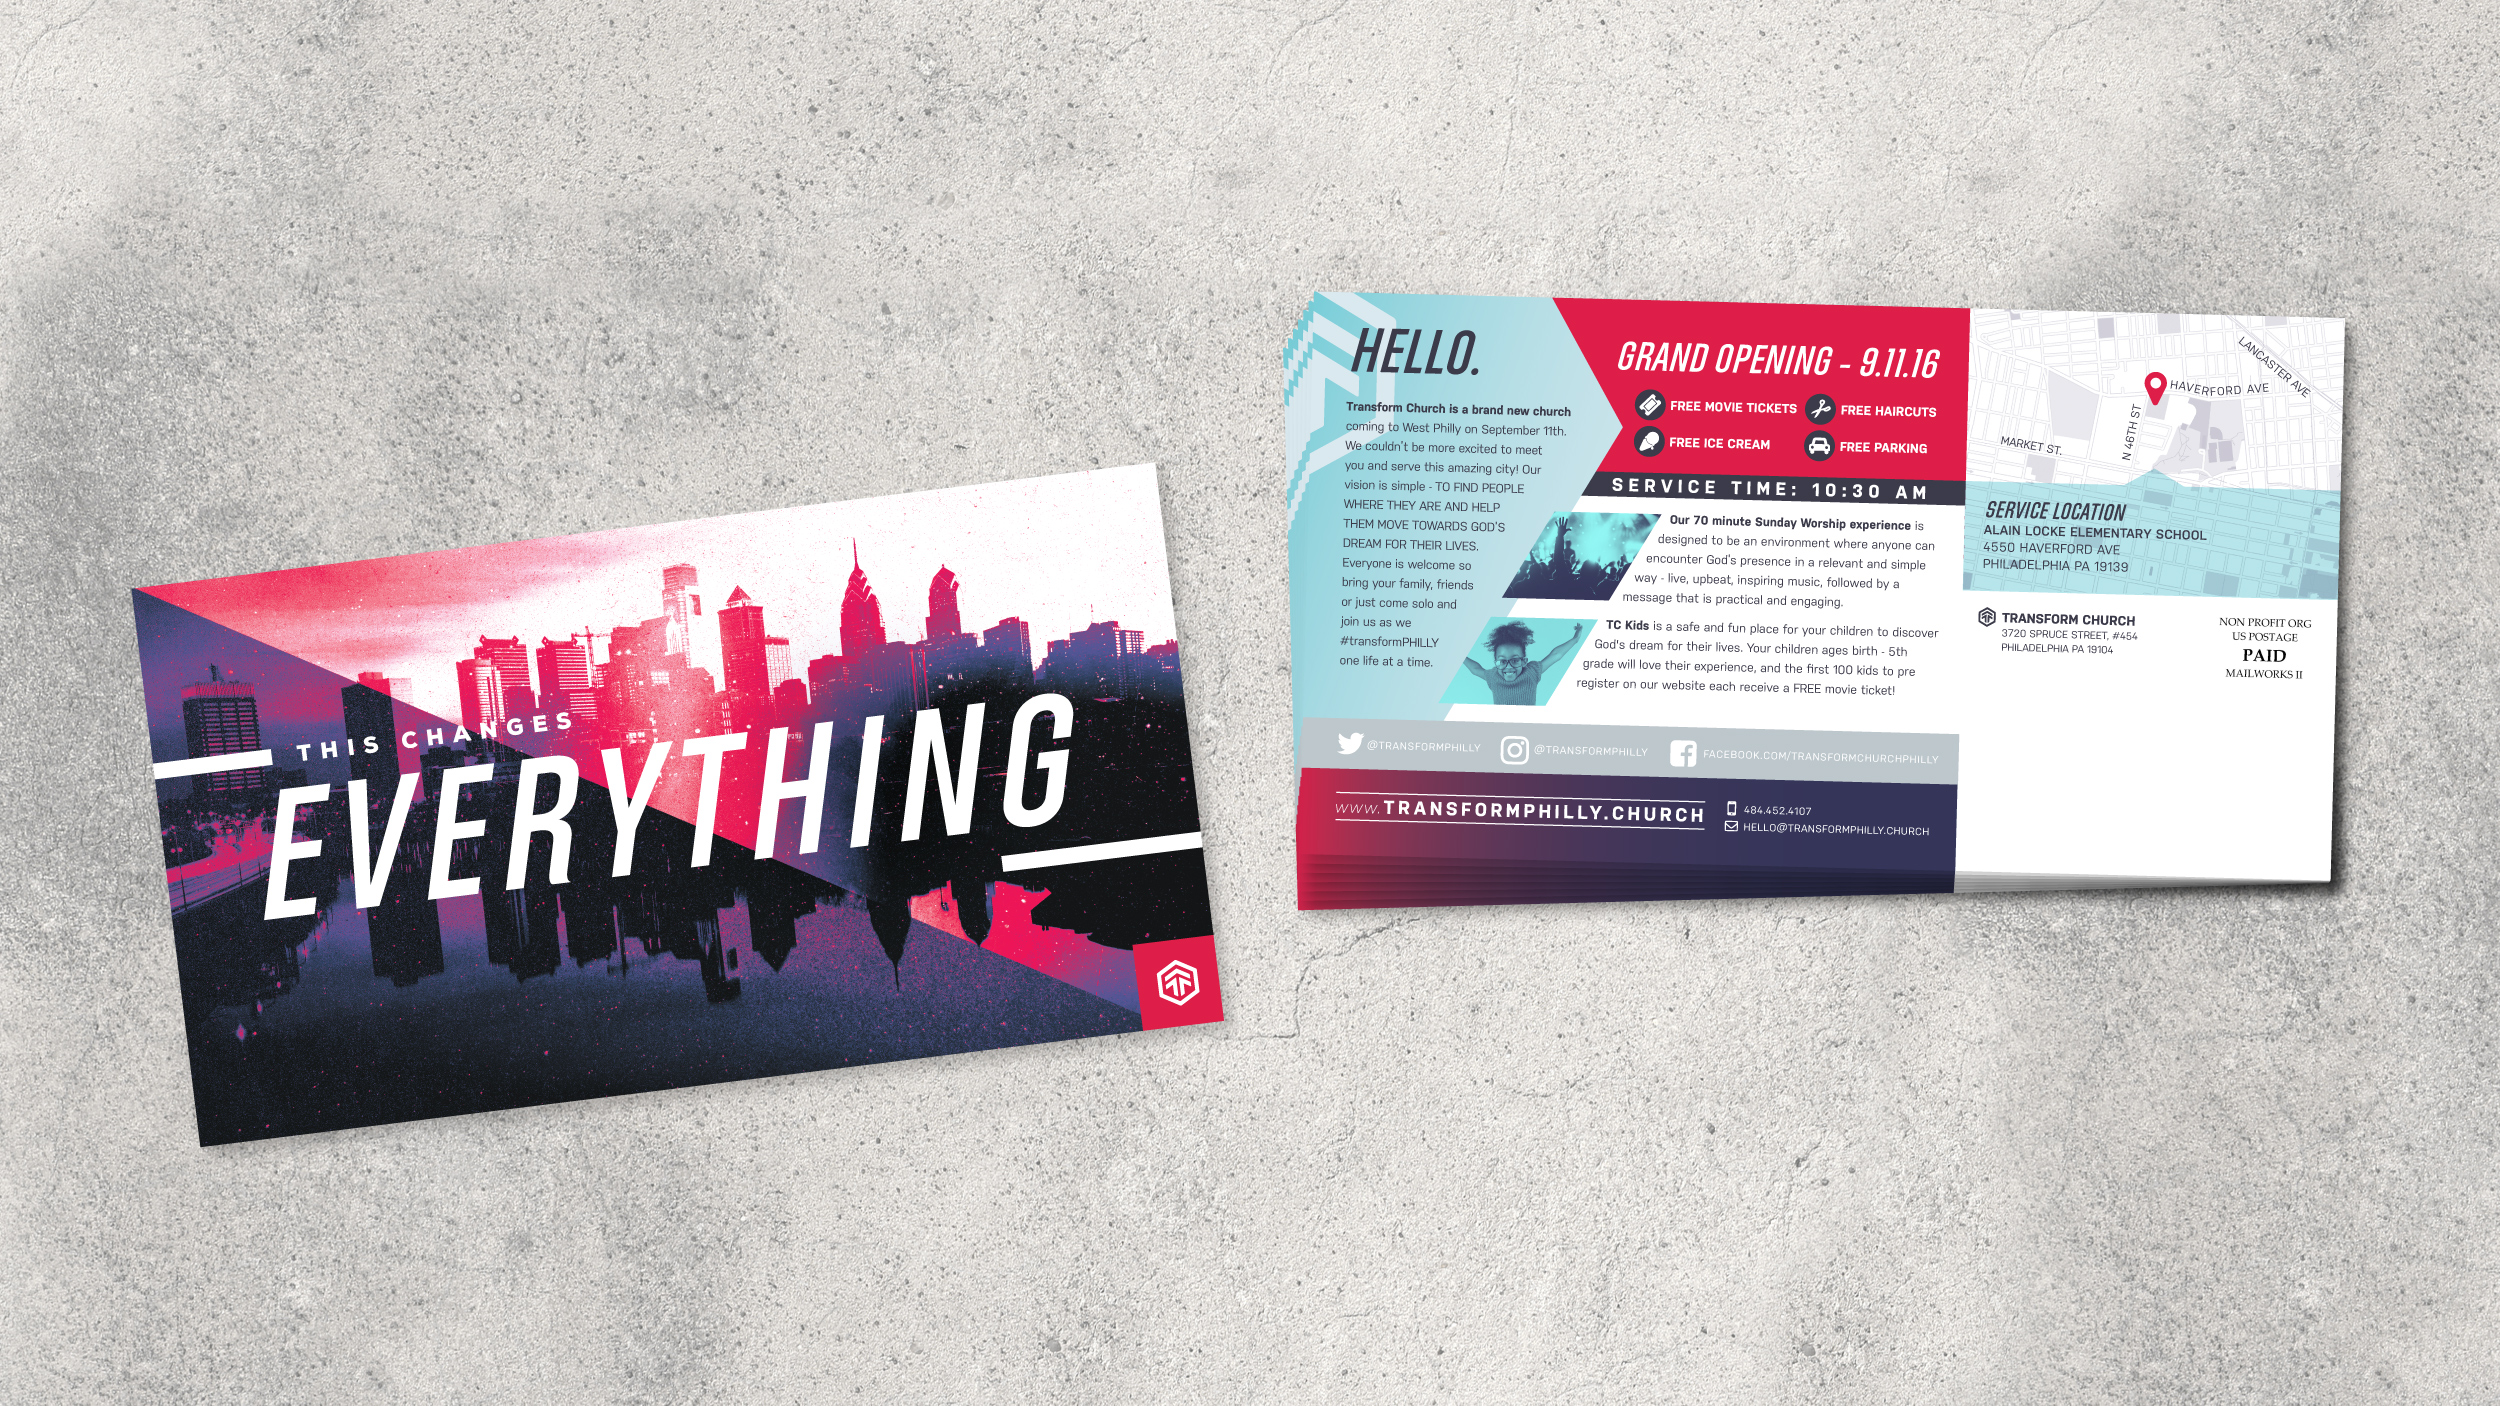 Church Grand Opening Flyer Transform Artspeak Creative